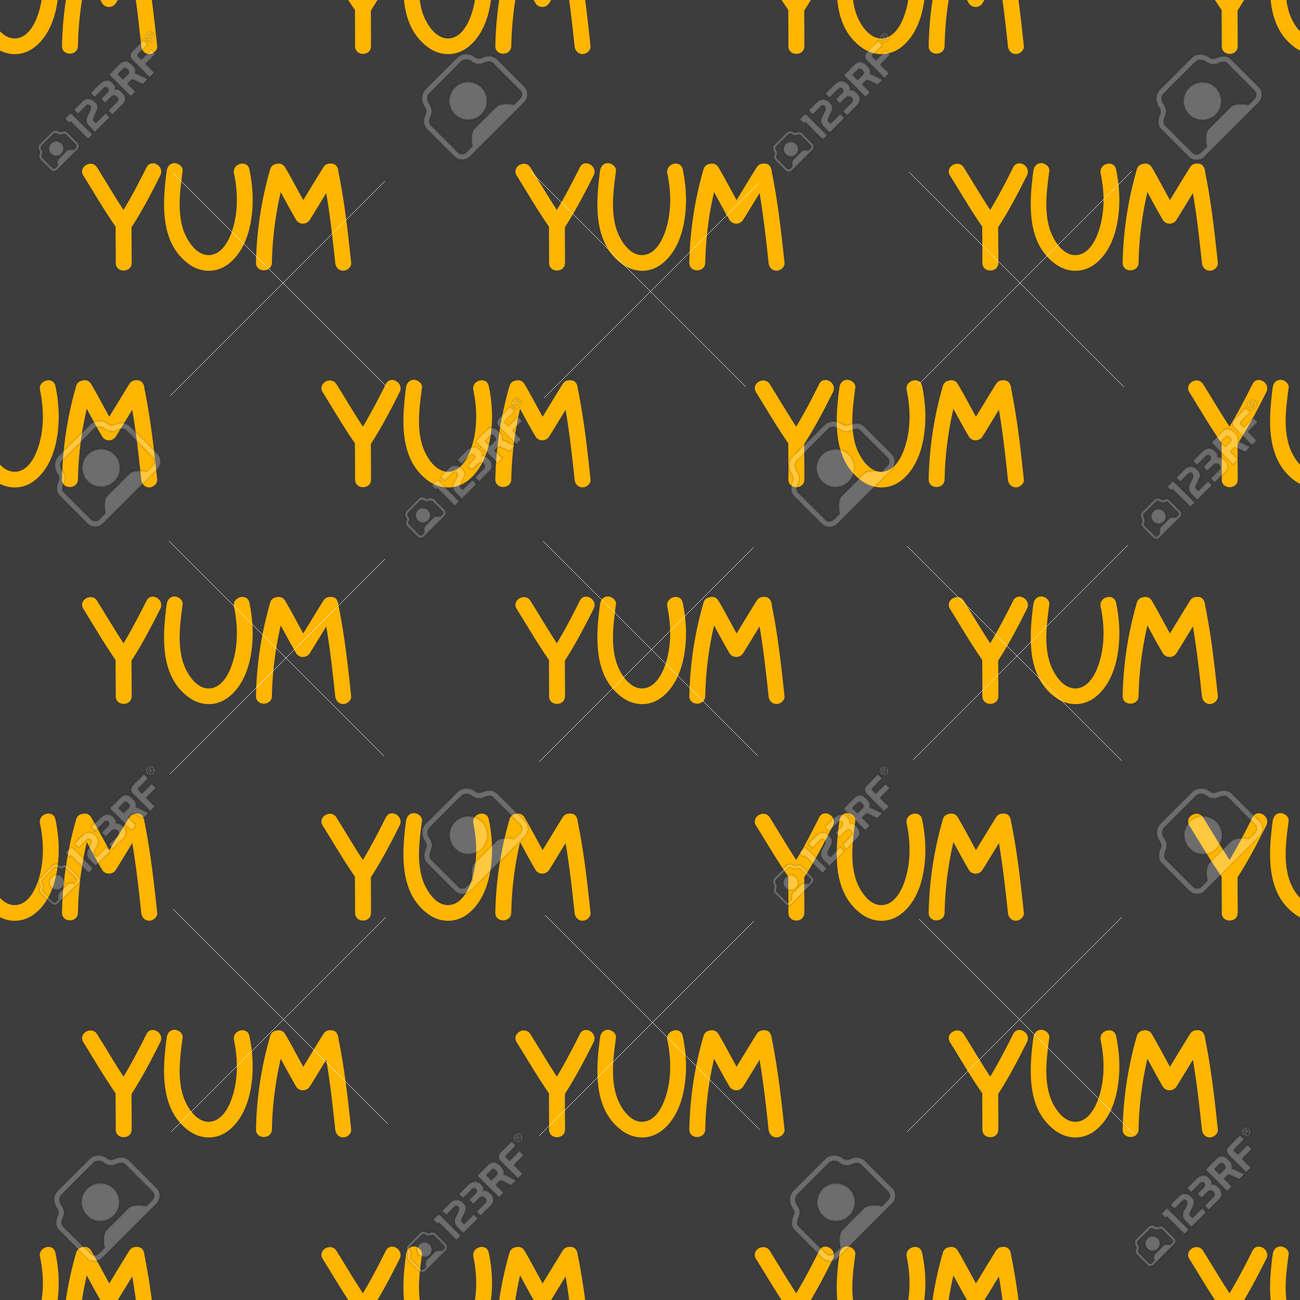 Yum-yum seamless pattern. Background with word yum - 167305082